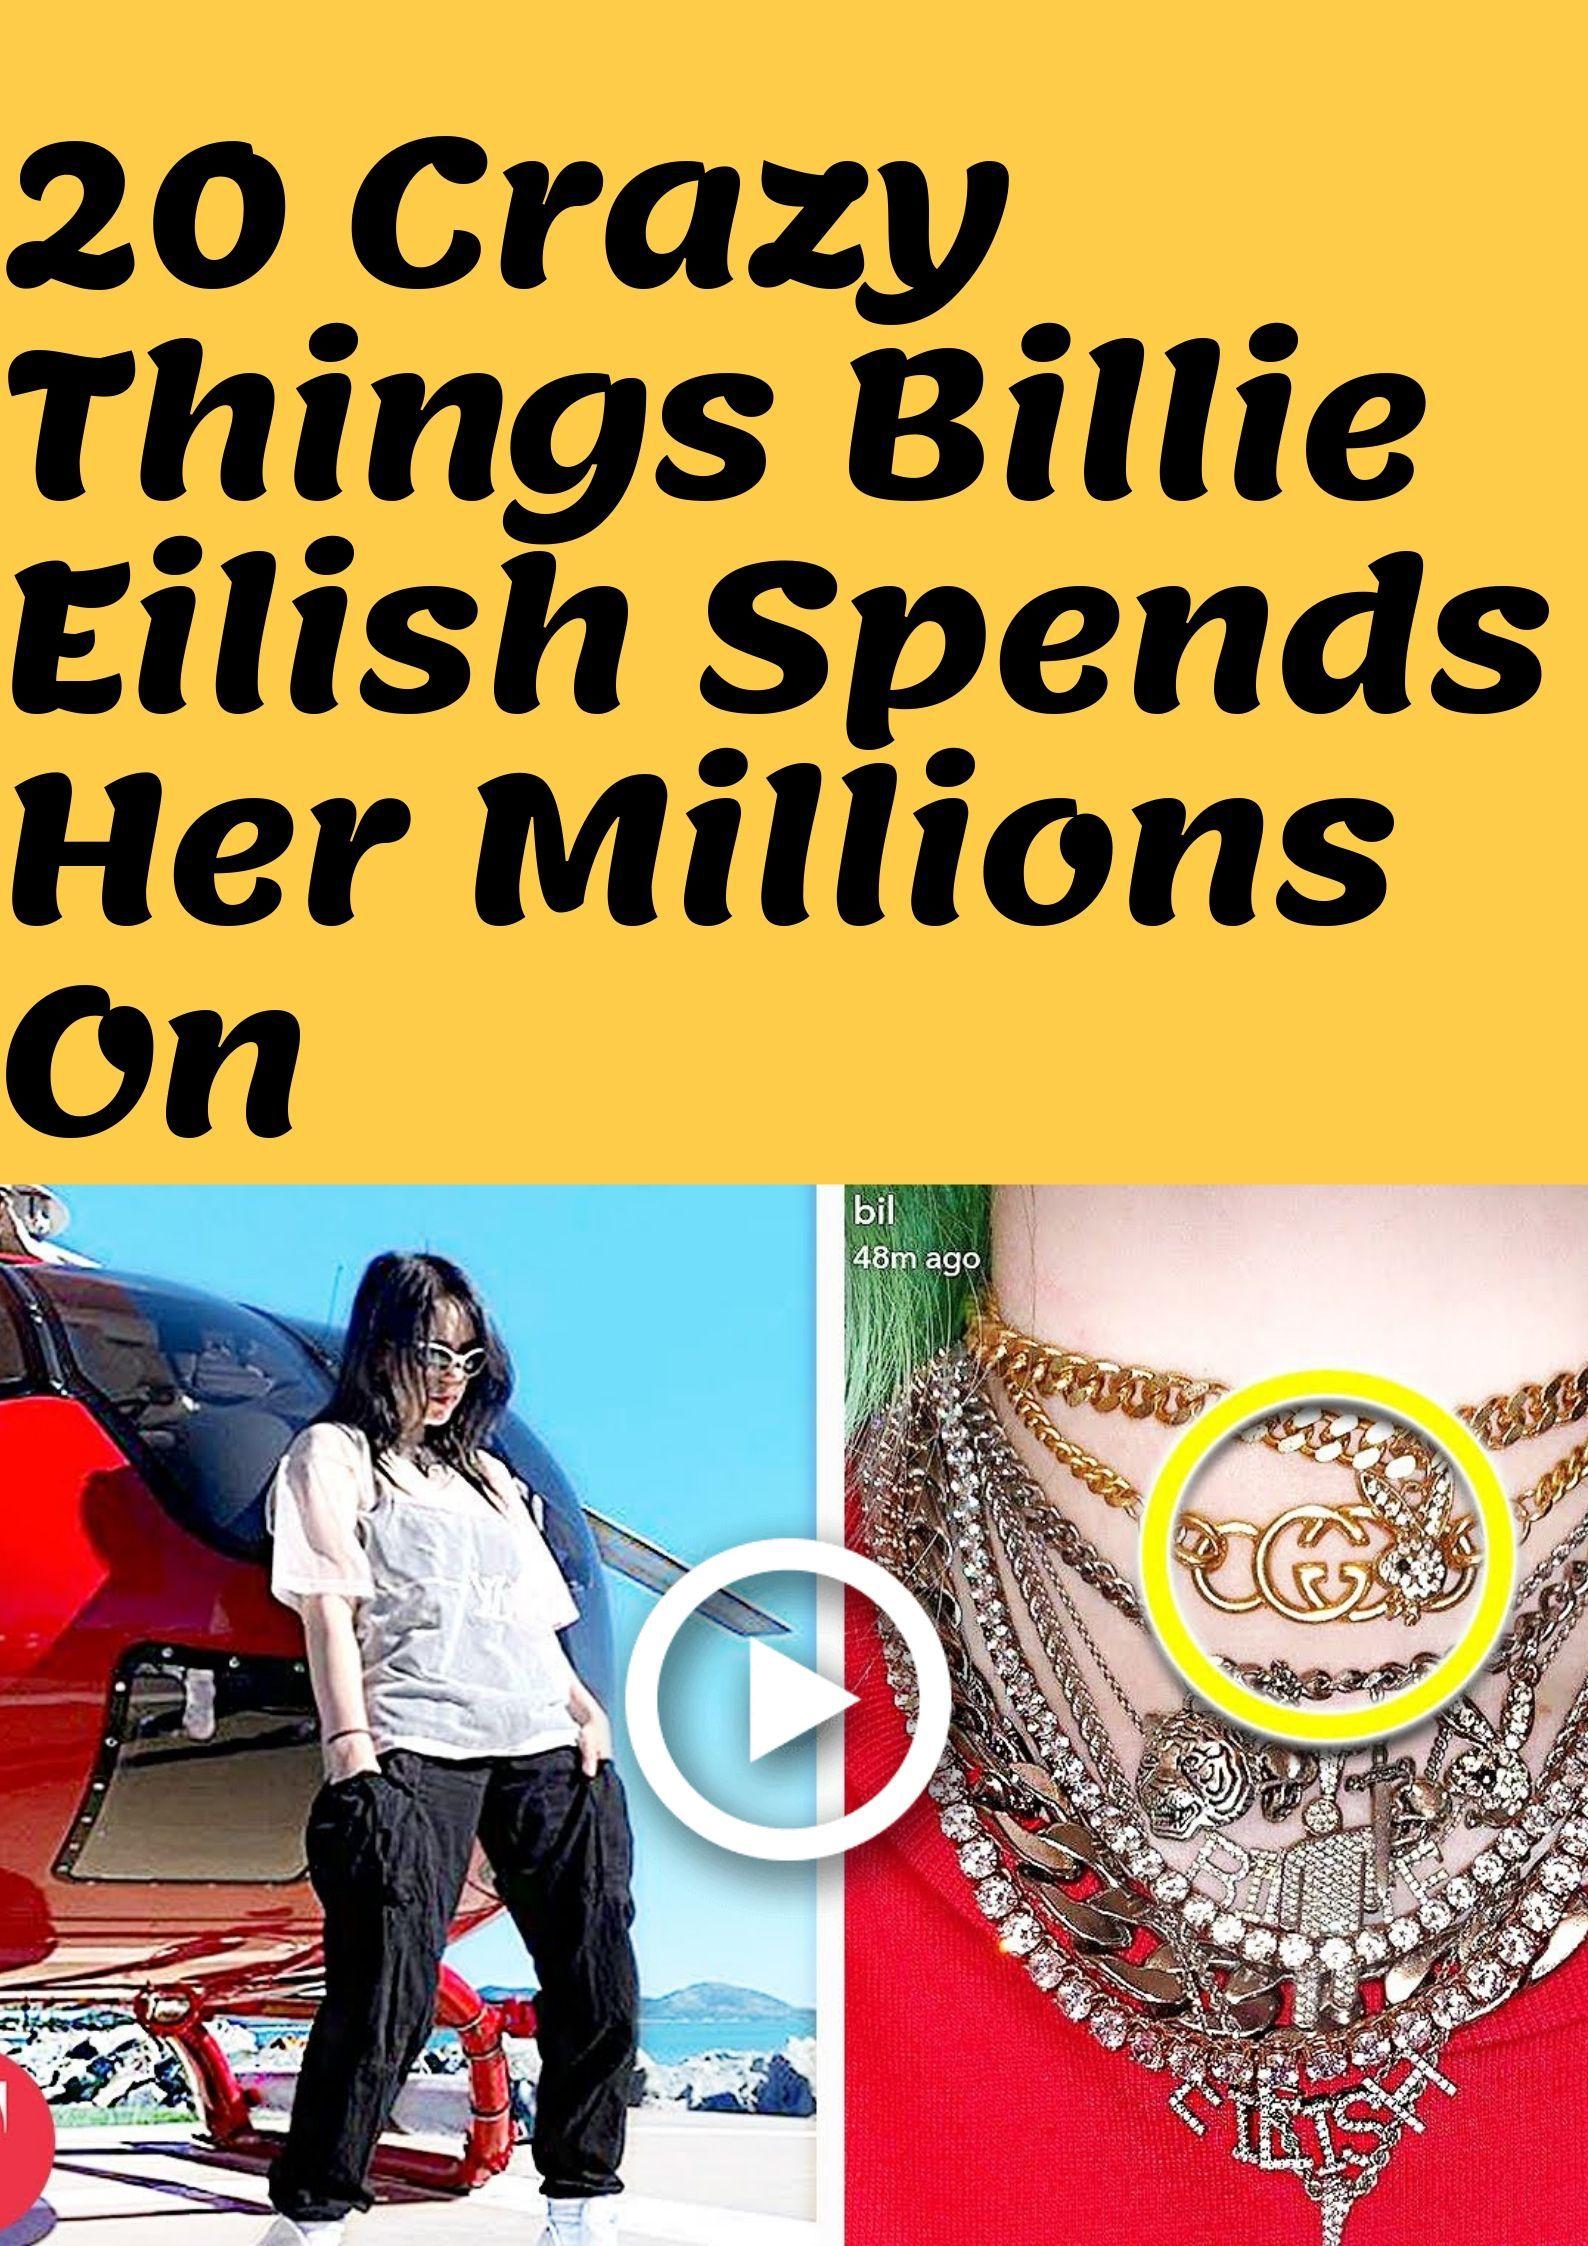 20 Crazy Things Billie Eilish Spends Her Millions On Billie Eilish Funny Cat Videos Billie